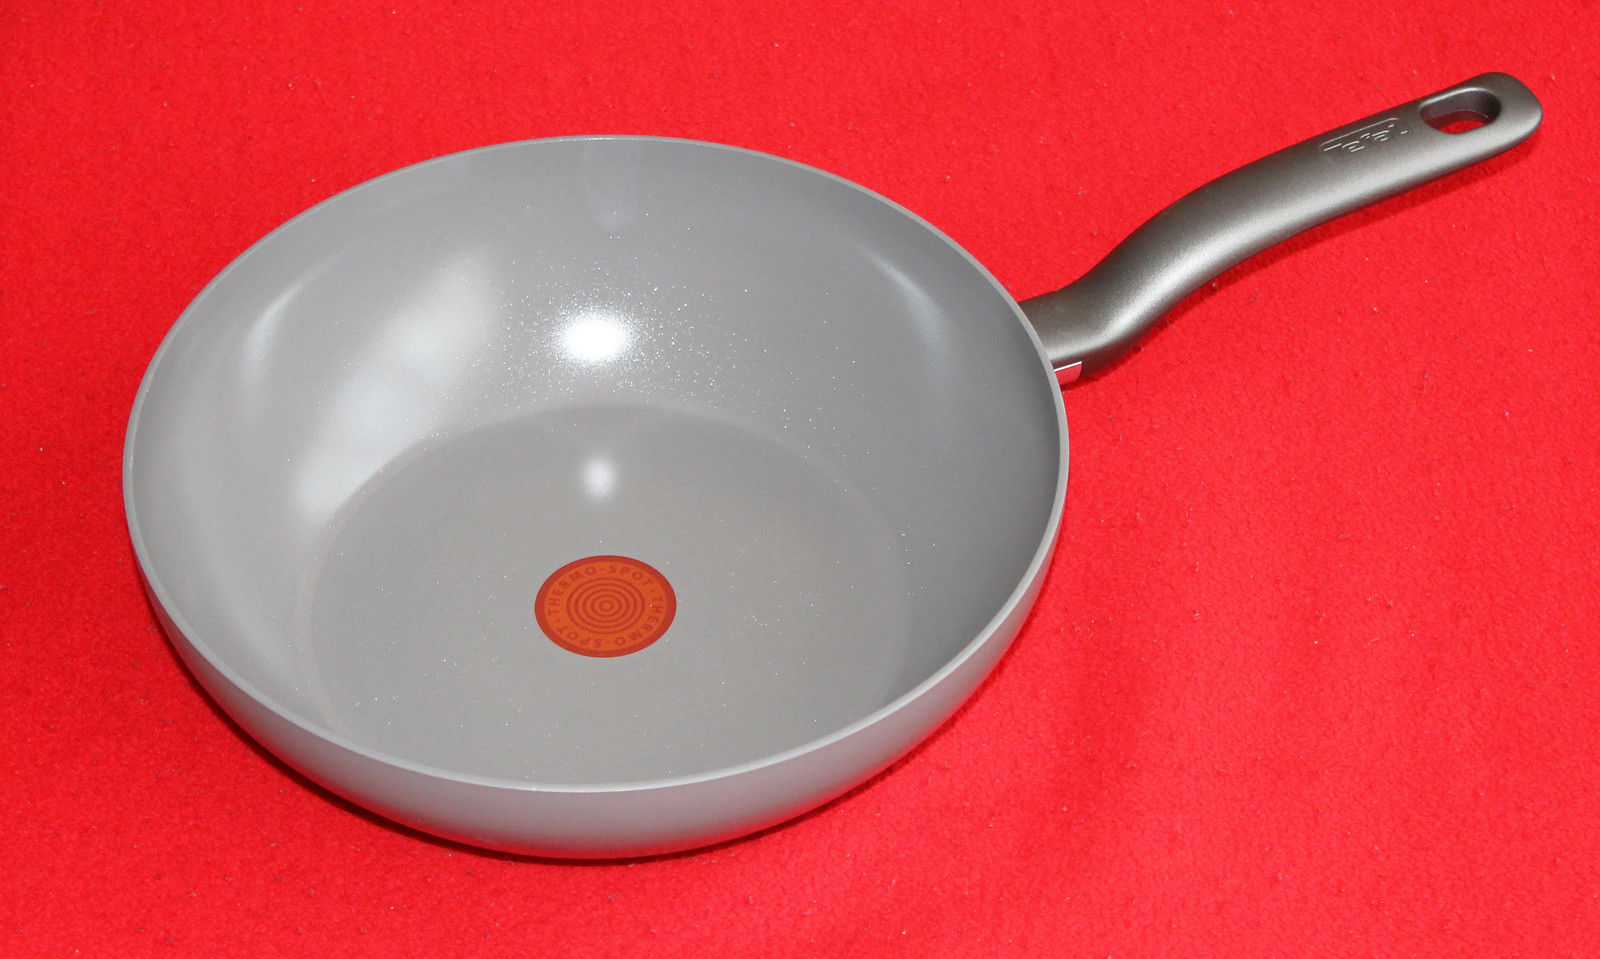 tefal gastro ceramic control induktion wok pfanne 28cm 8 5cm neu gastro. Black Bedroom Furniture Sets. Home Design Ideas